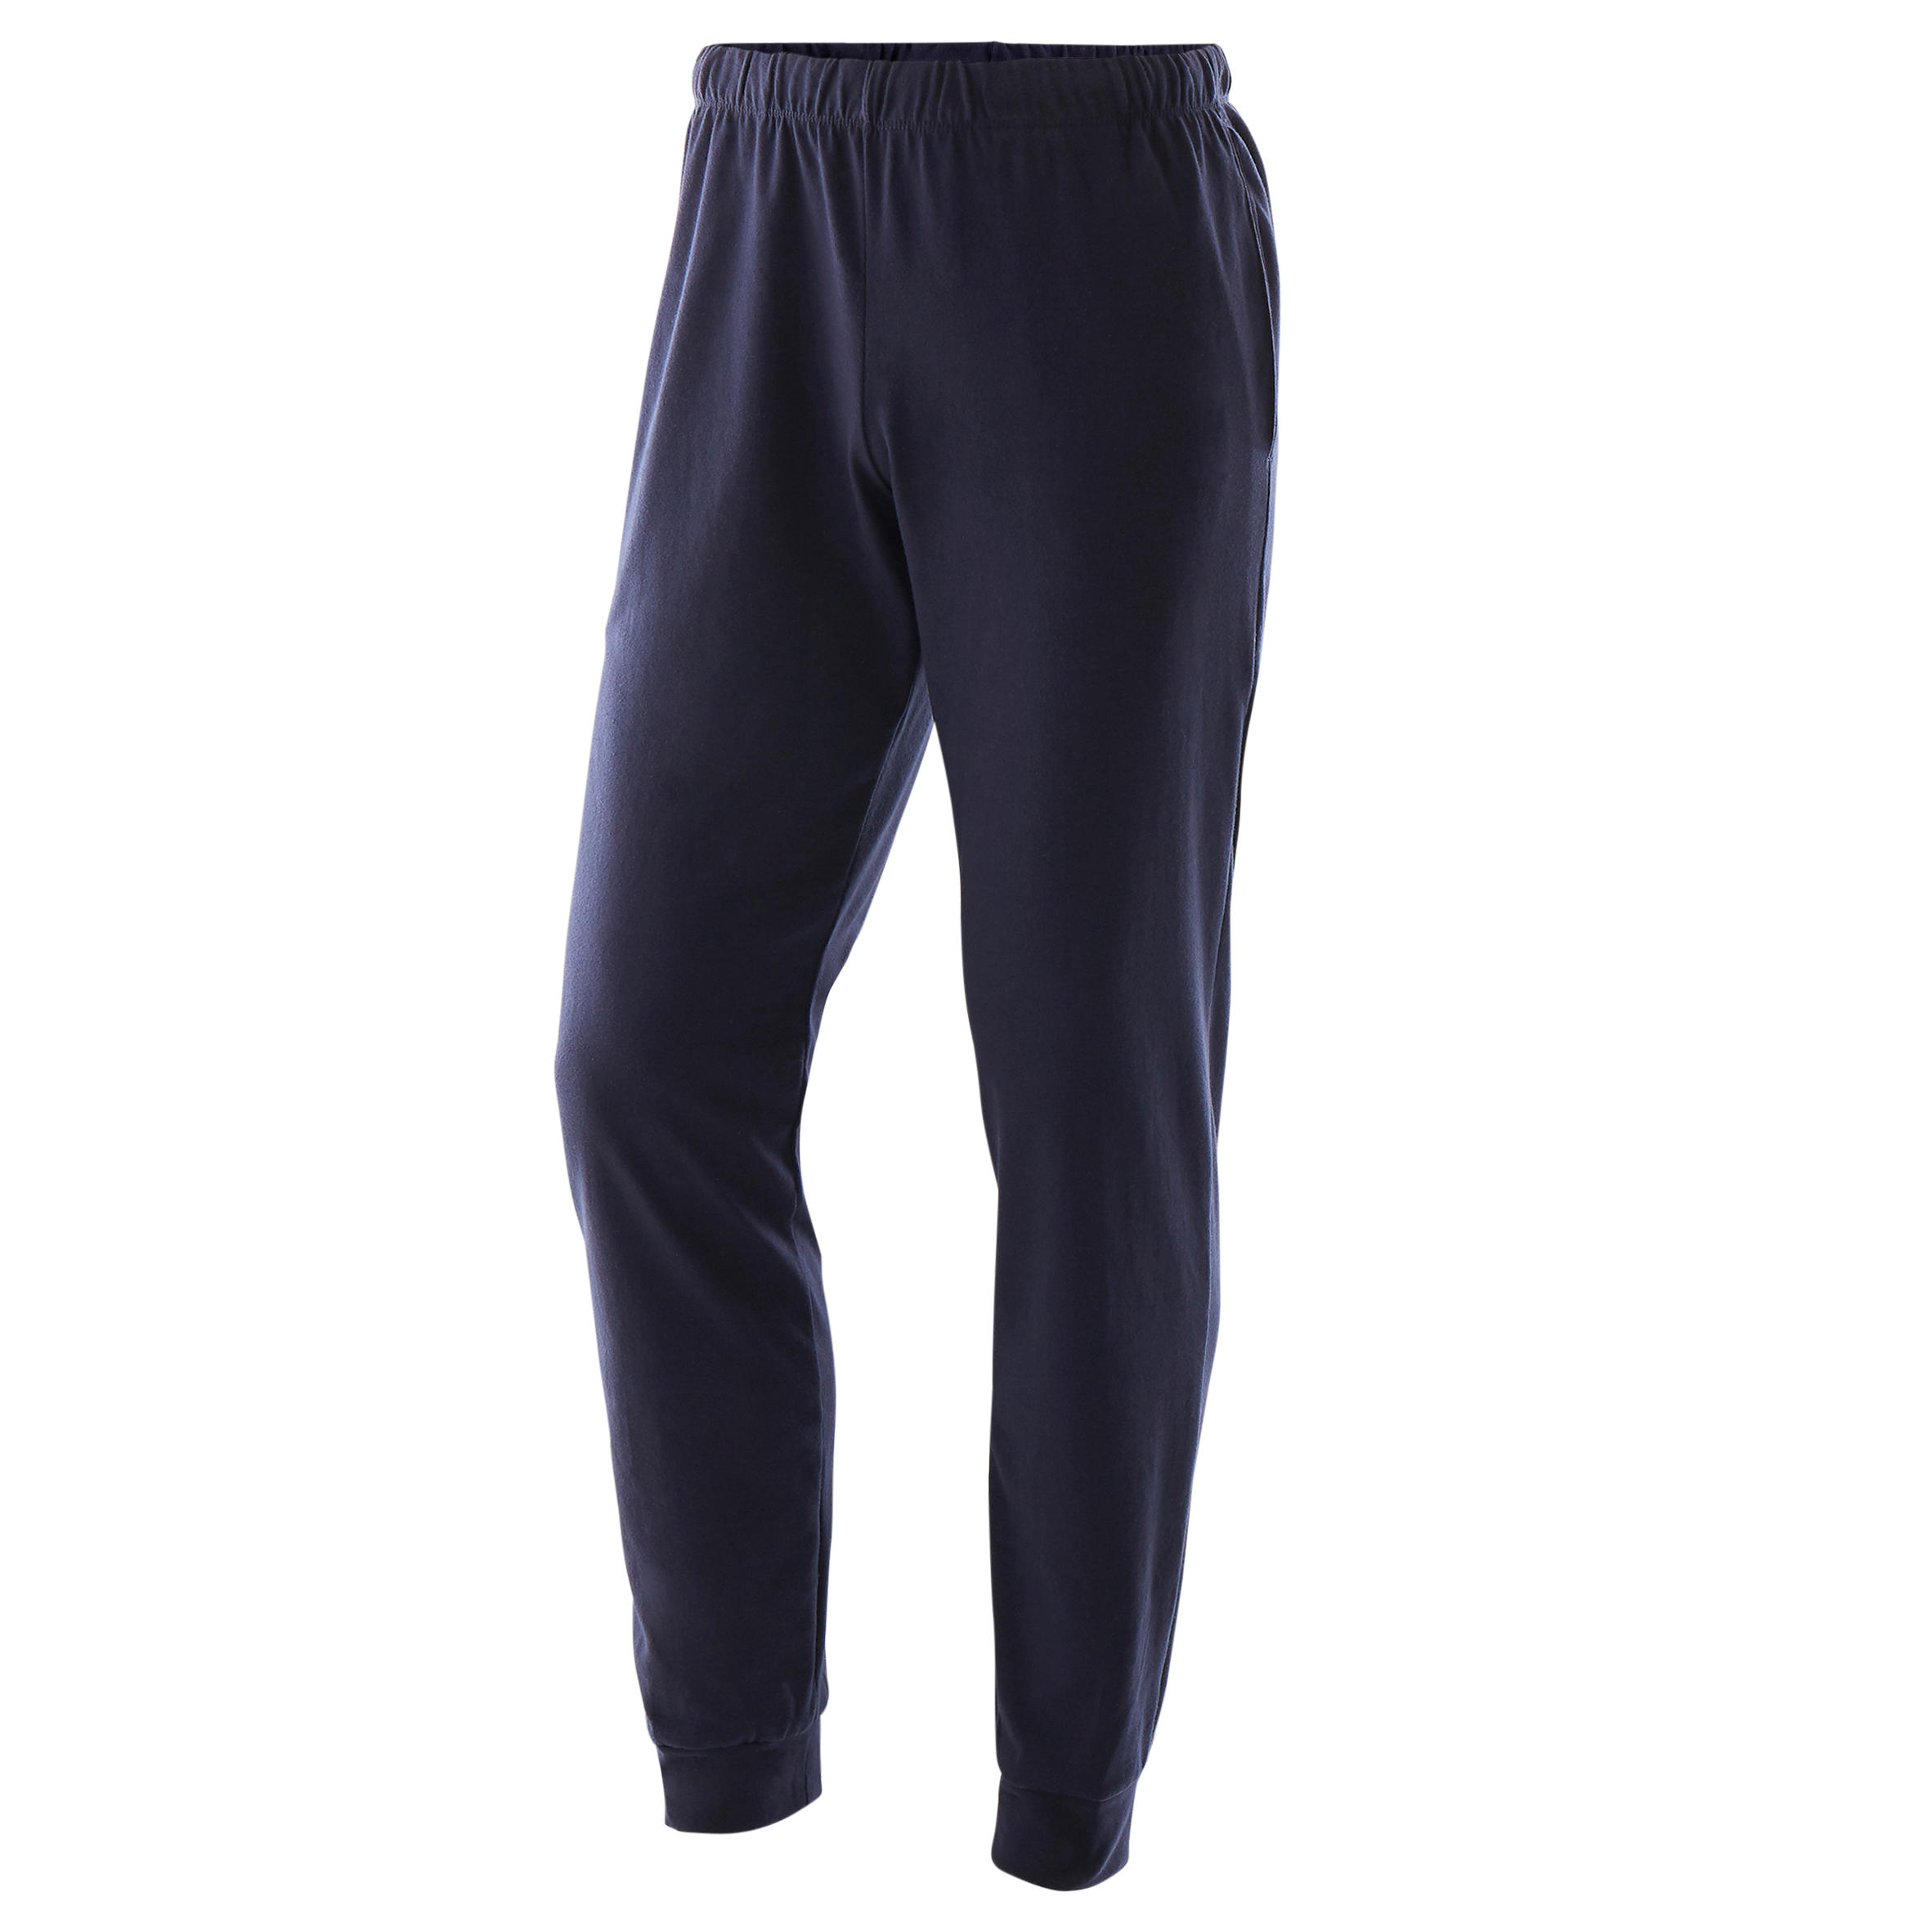 Pantalon Regular 120 Bărbați imagine produs